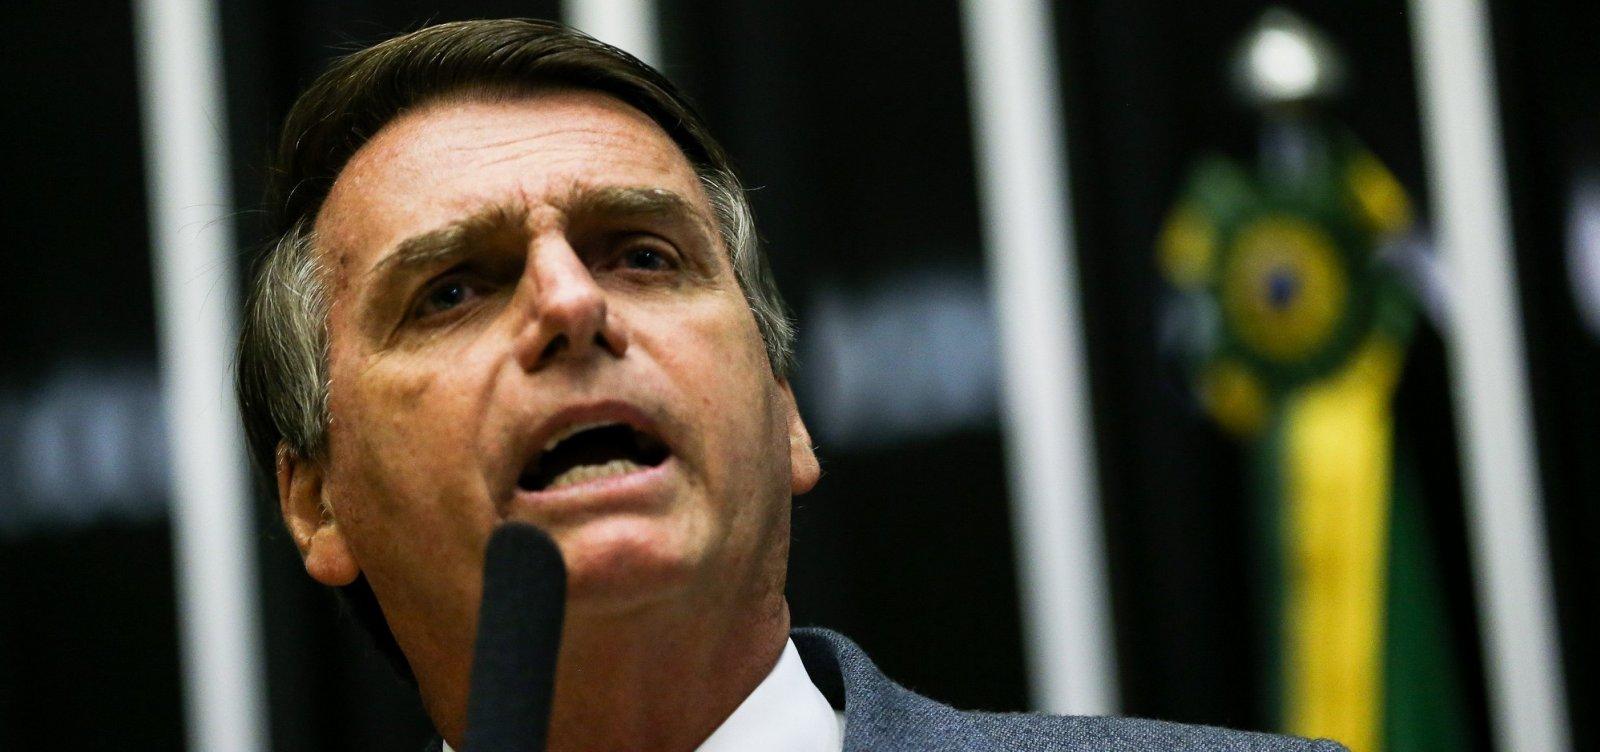 [Bolsonaro desiste de debate, mas convoca ato político no Rio de Janeiro]